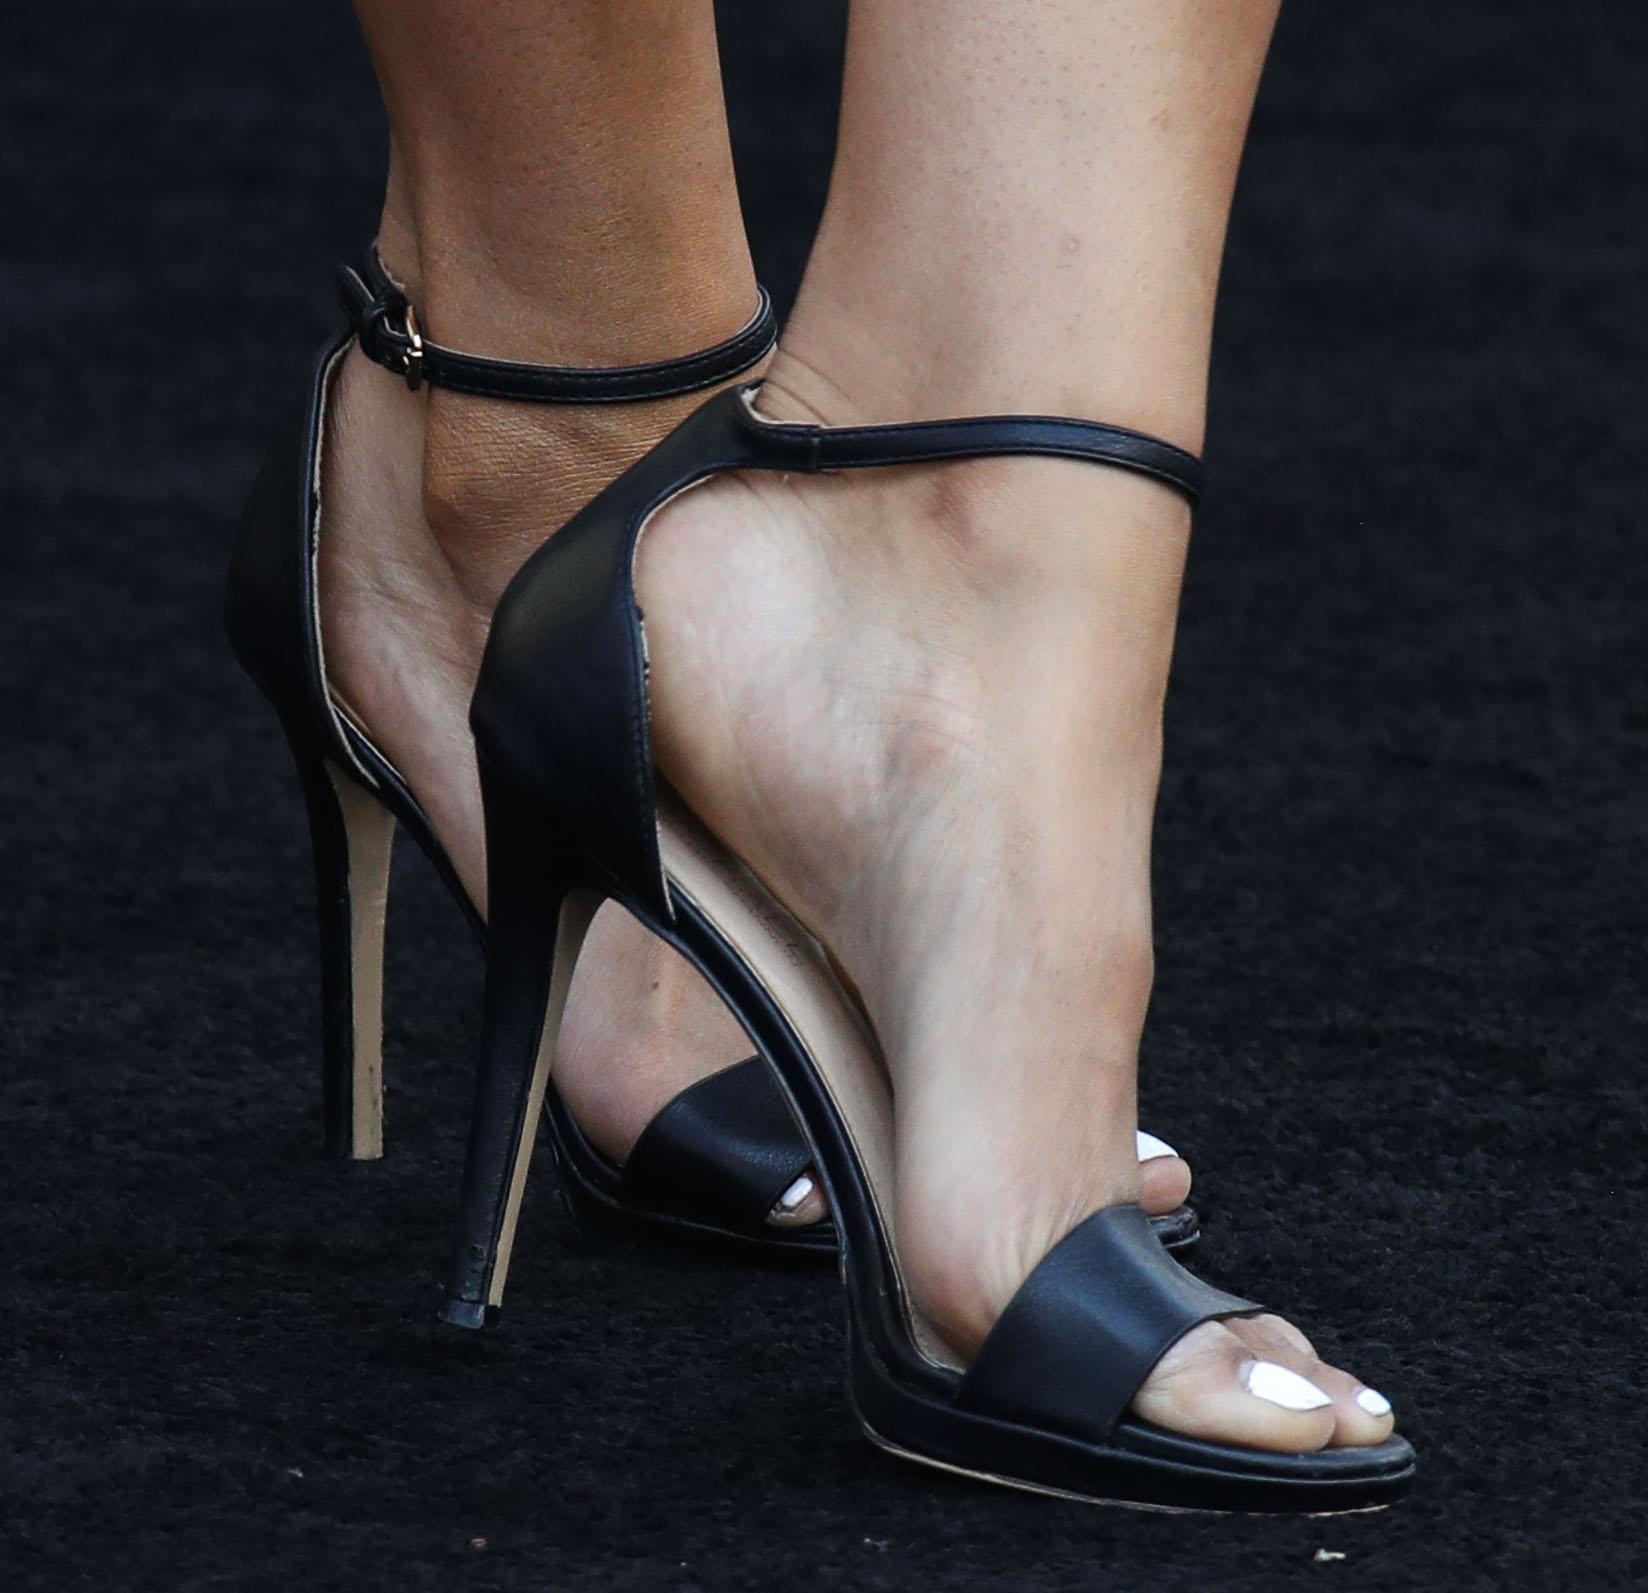 Jordin Sparks shows off her white pedicure in minimalist black open-toe heels